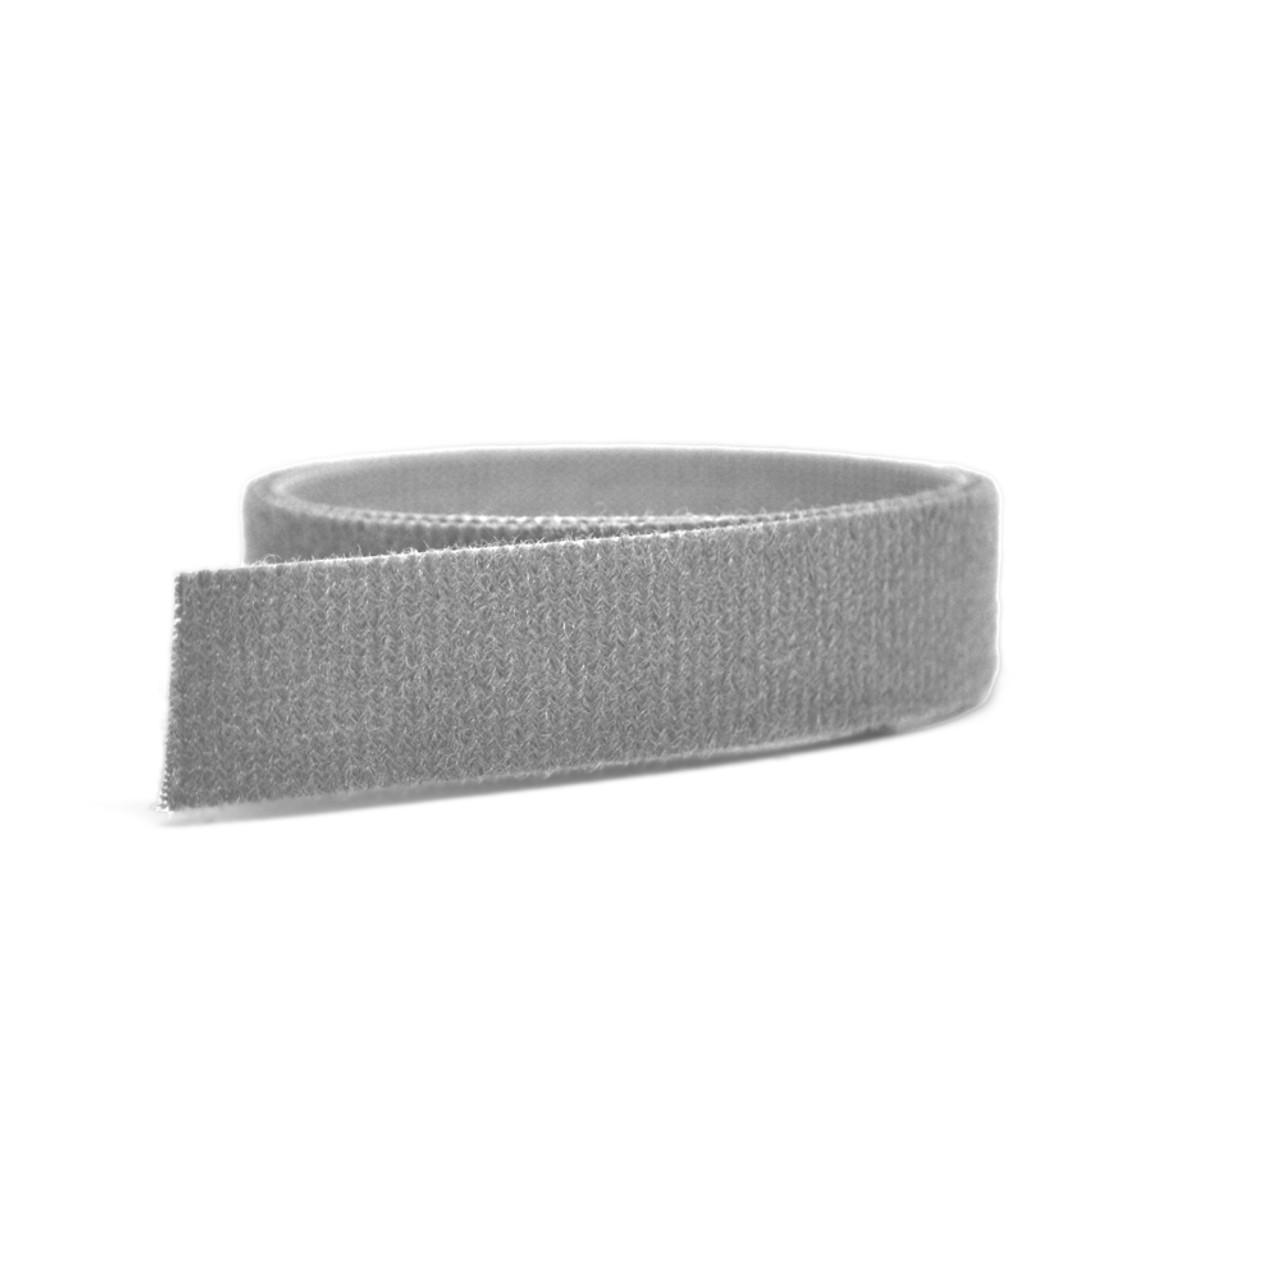 VELCRO® Brand ONE-WRAP® Gray Tape Mini Rolls / Velcro Straps - Bundling Straps - Velcro Tie - Velcro Strap